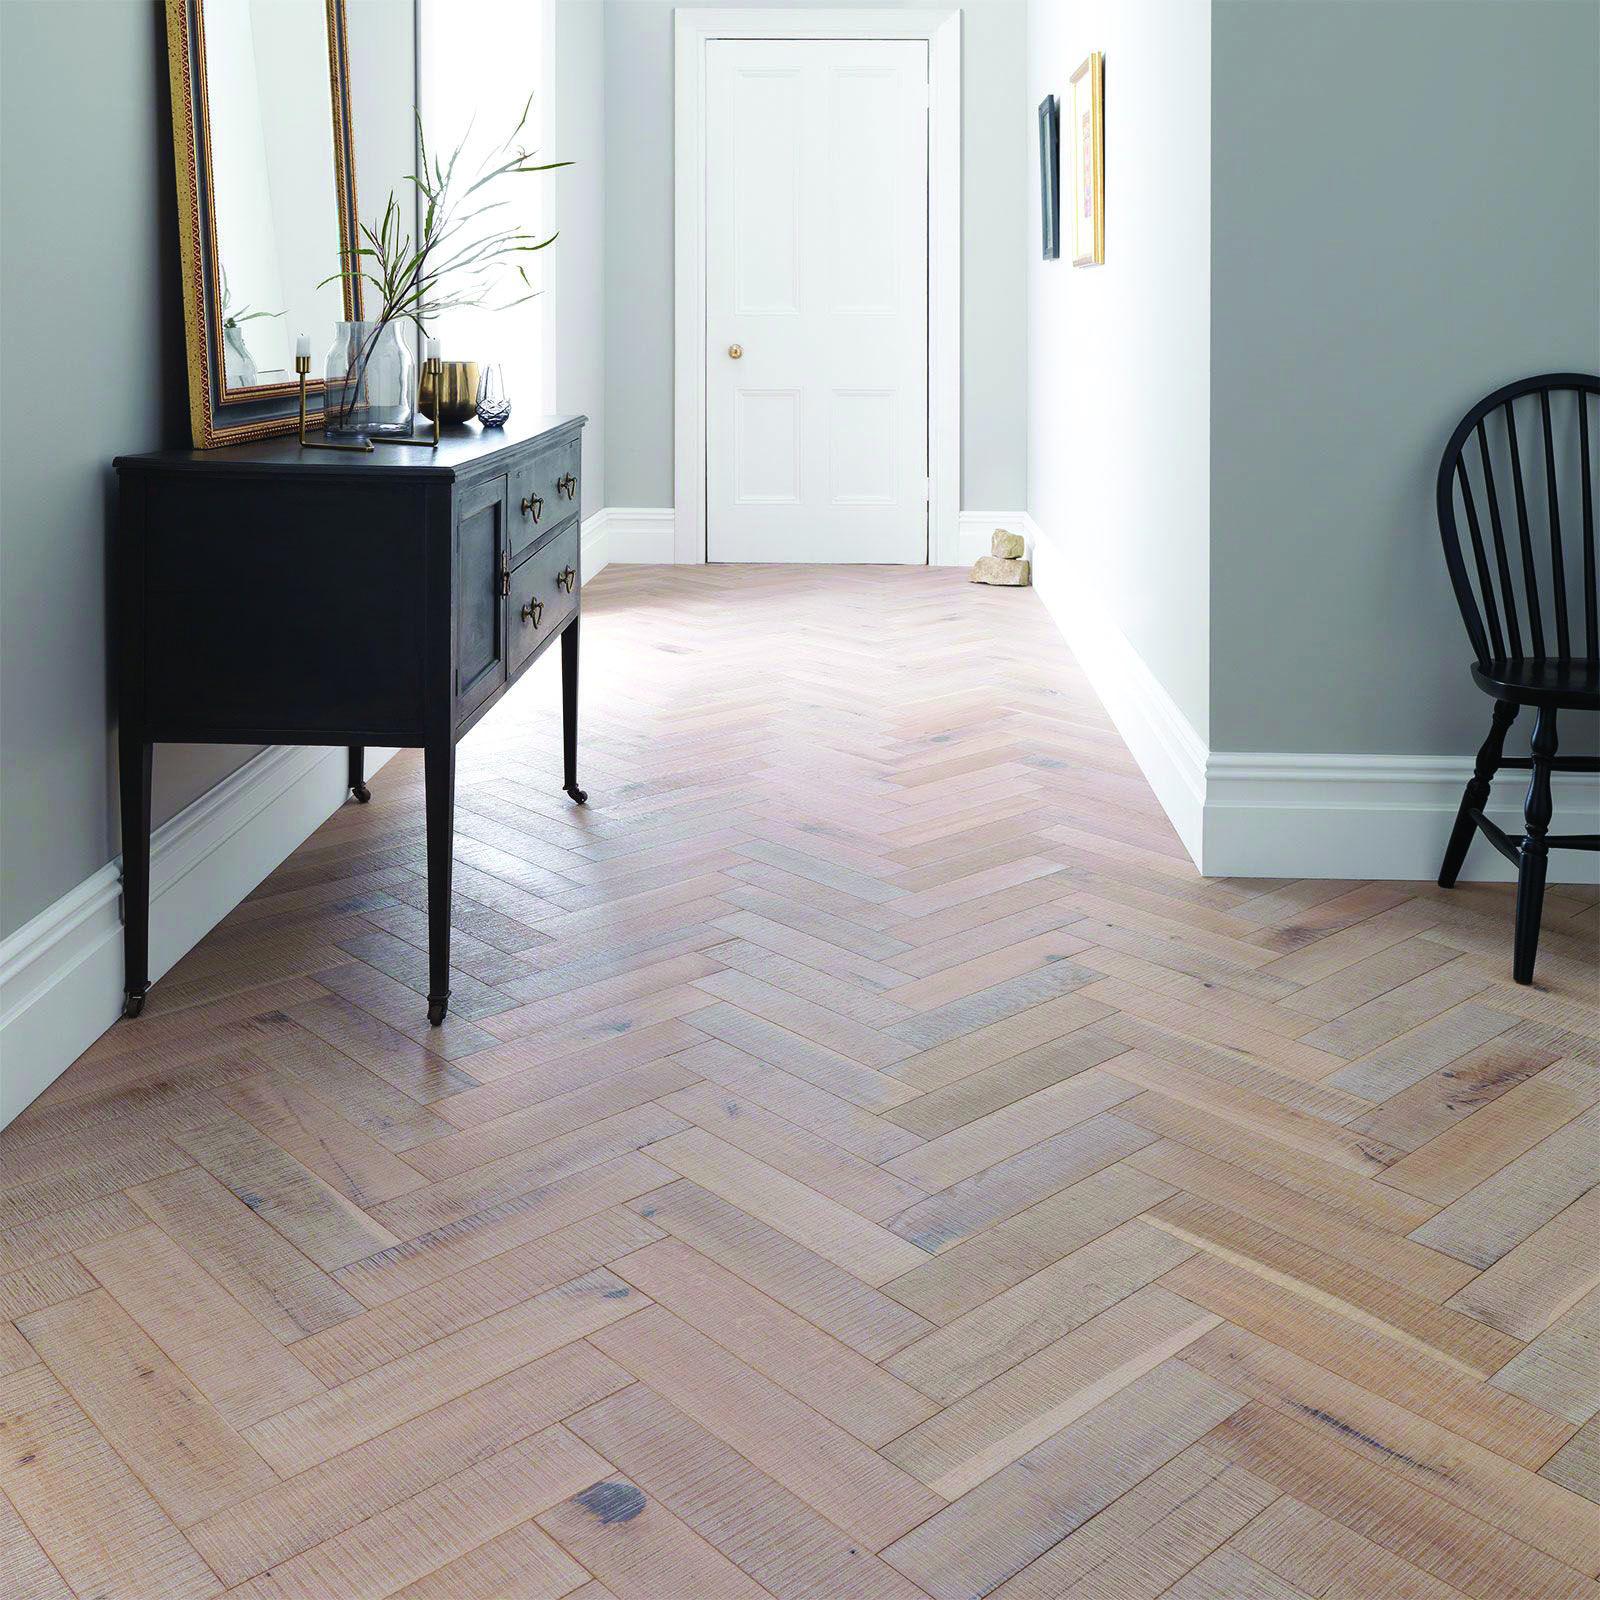 Unbelievable Parquet Flooring 4 X 4 For Your Home